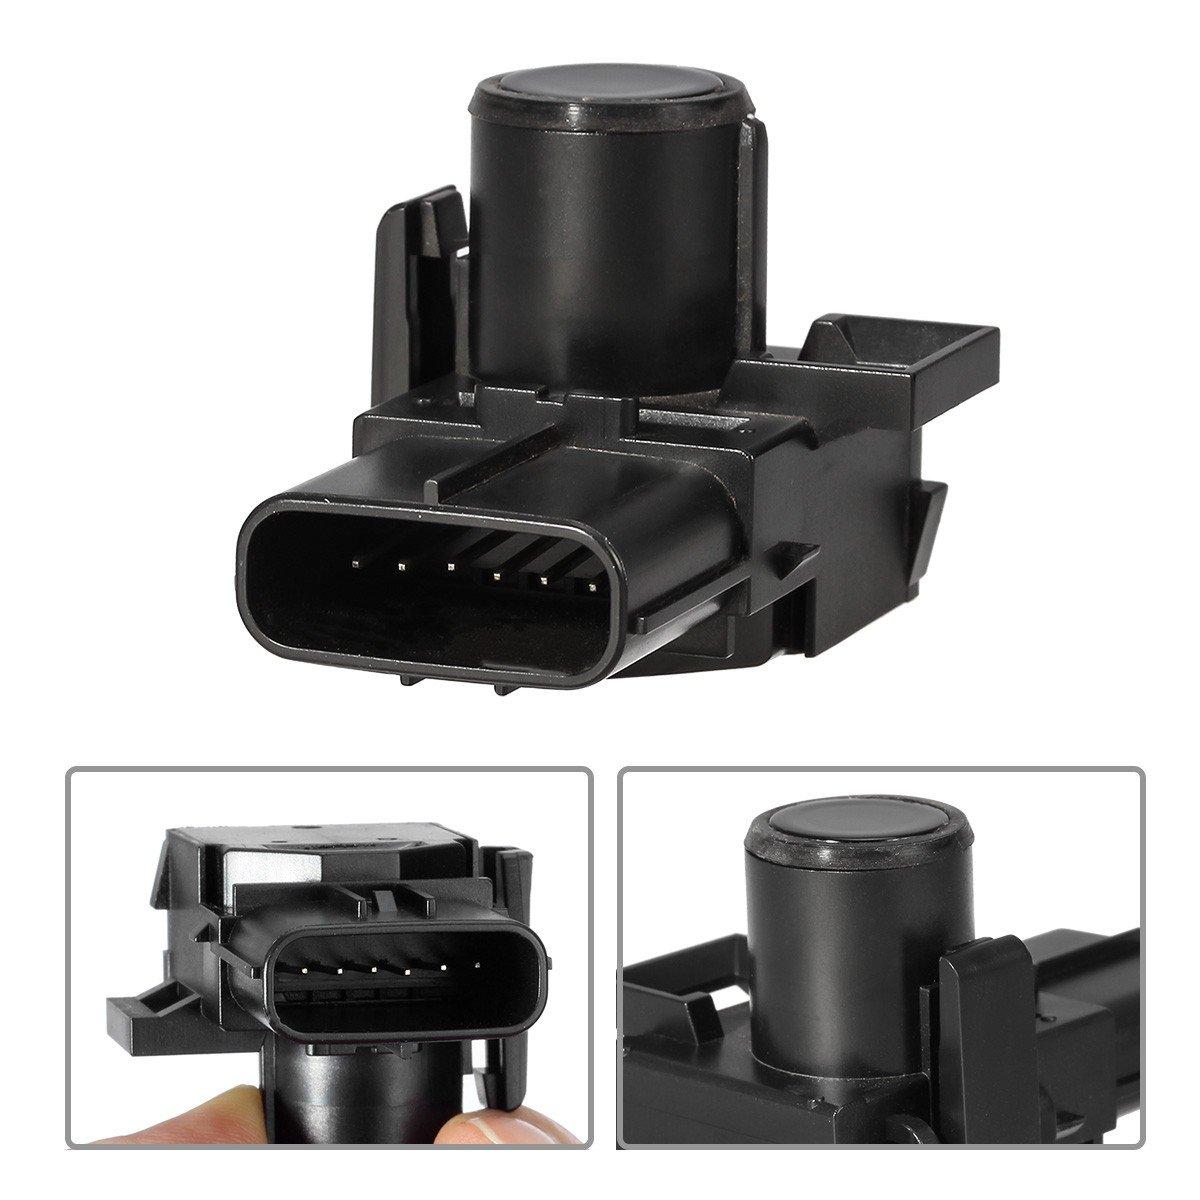 AUTEX 1pc Parking Assist Sensor compatible with 2013-2014 LEXUS LX570 Toyota Avalon Toyota Land Cruiser 2012-2014 LEXUS RX350 2012-2014 Lexus RX450h 2012 2013 Toyota Camry